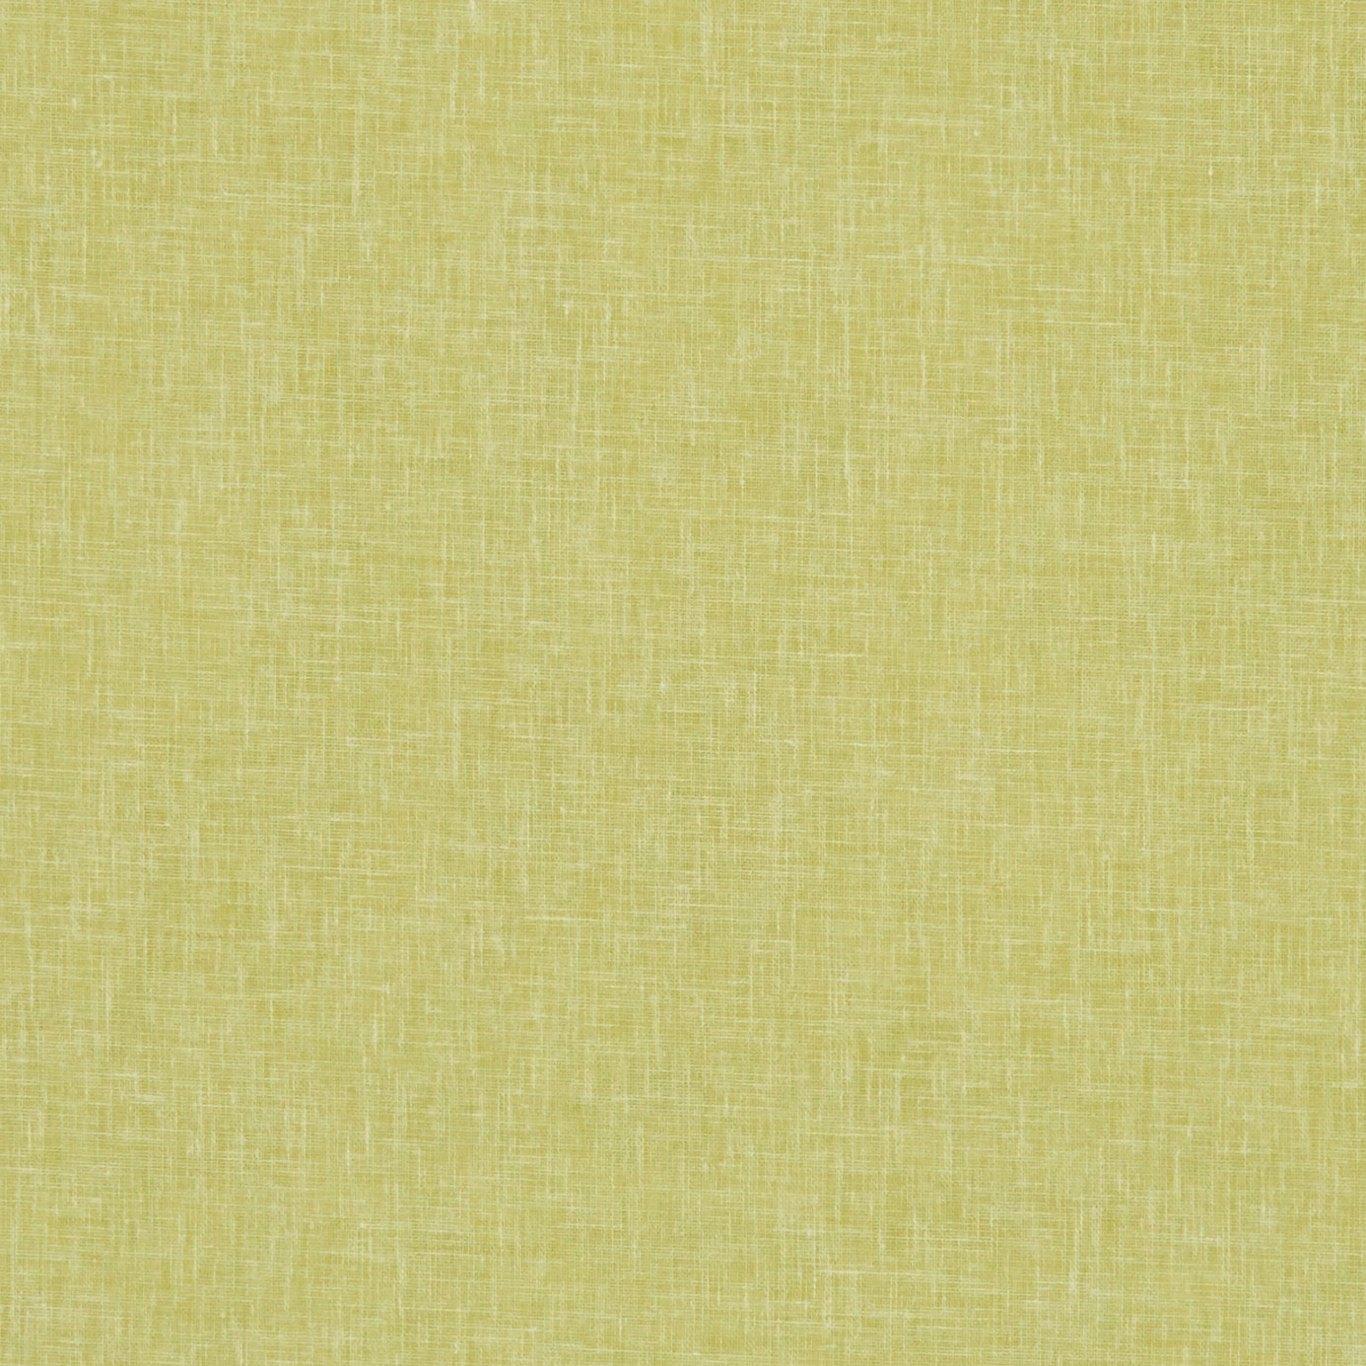 Midori Citron